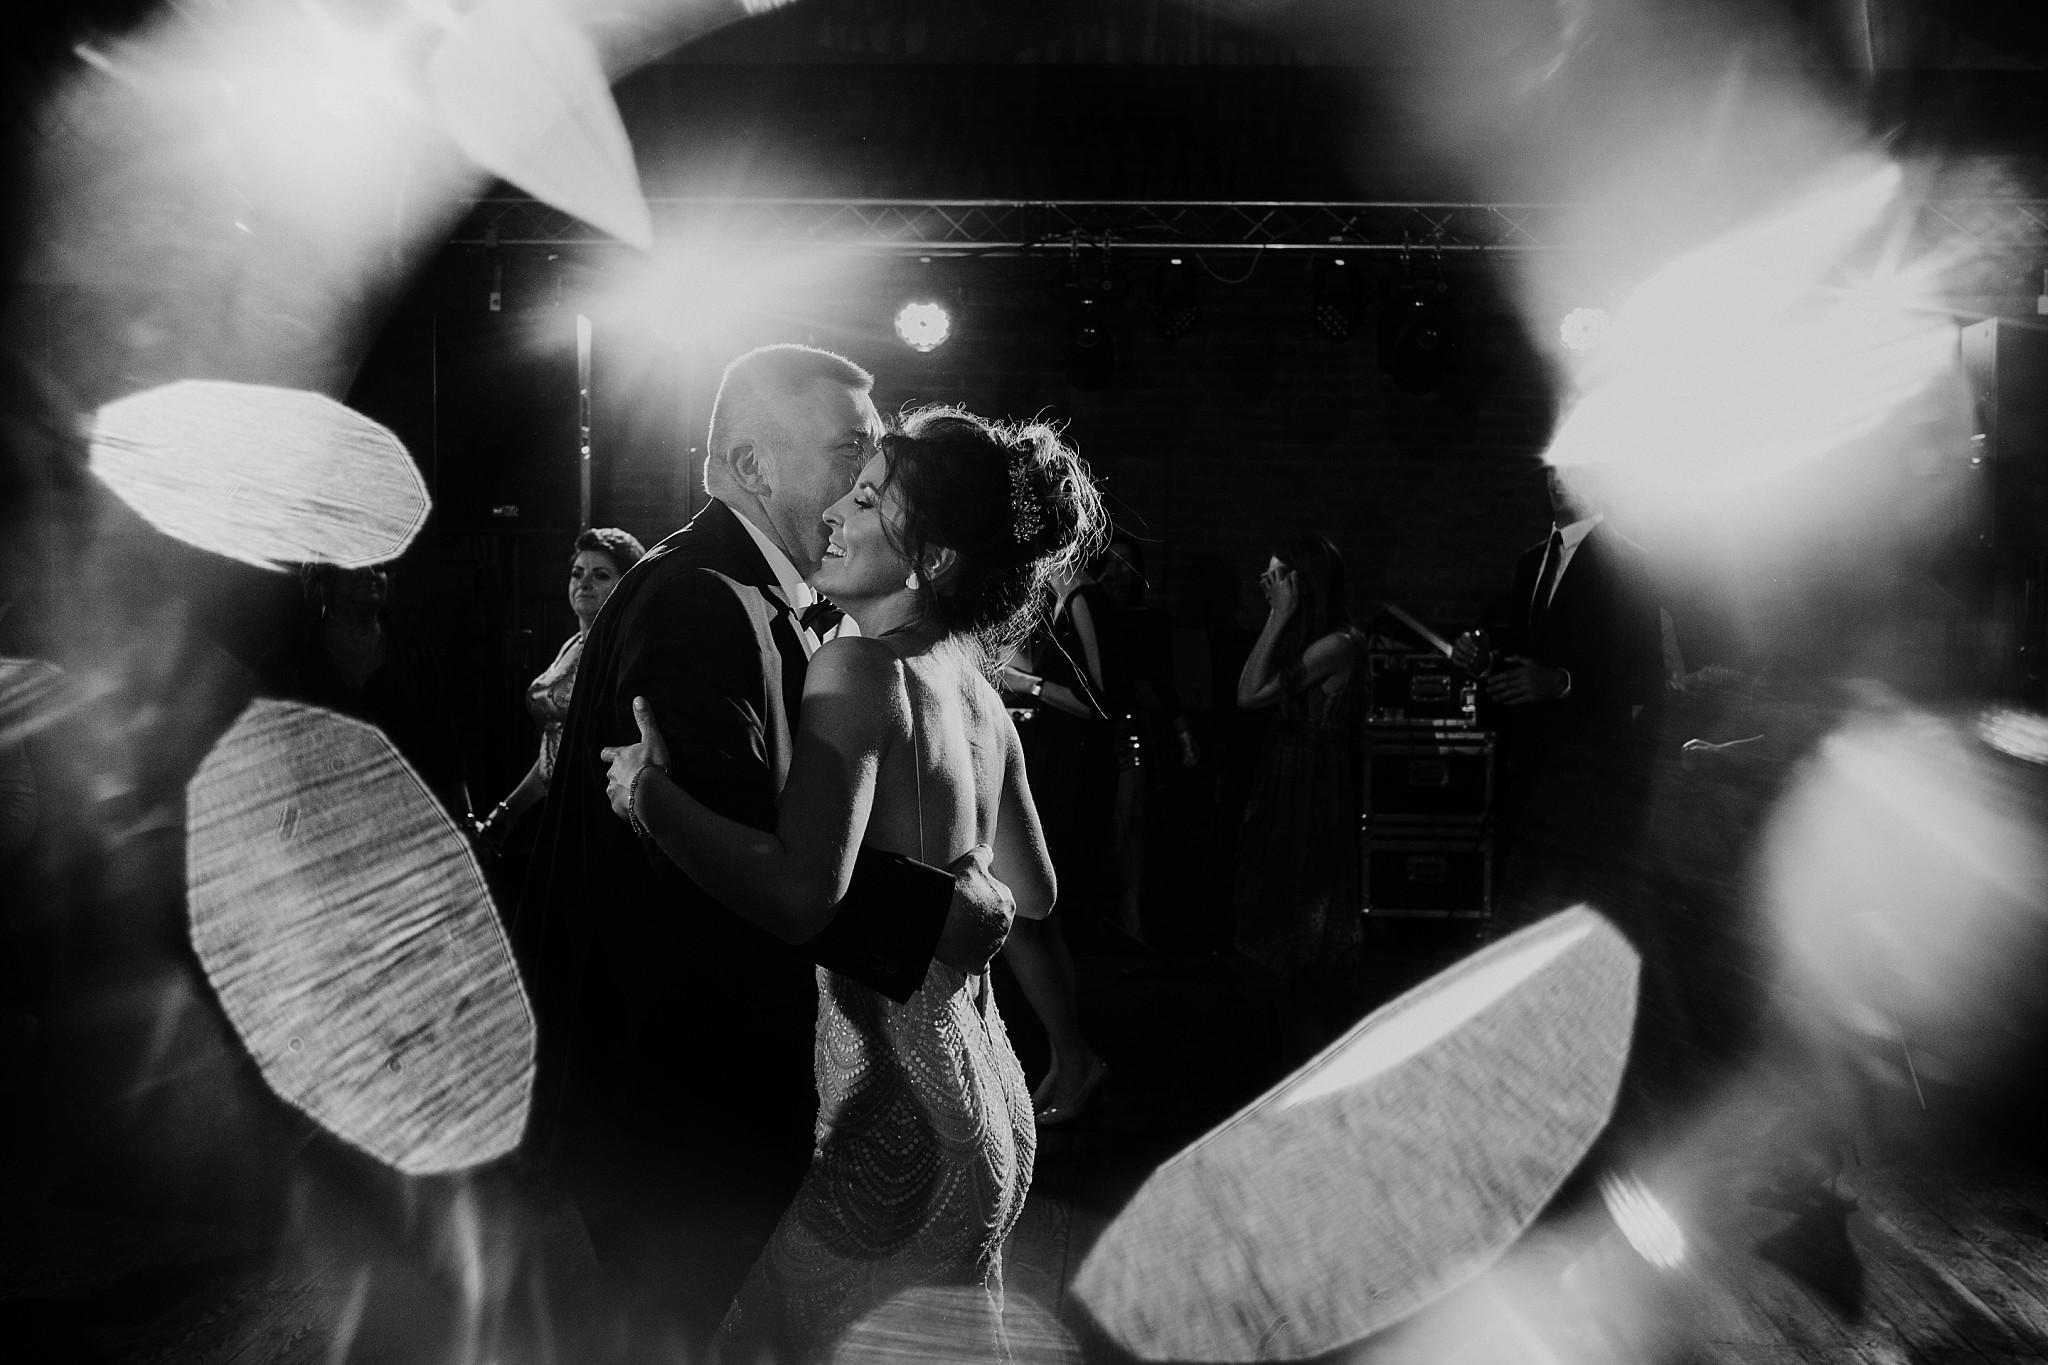 fotograf poznan wesele dobra truskawka piekne wesele pod poznaniem wesele w dobrej truskawce piekna para mloda slub marzen slub koronawirus slub listopad wesele koronawirus 391